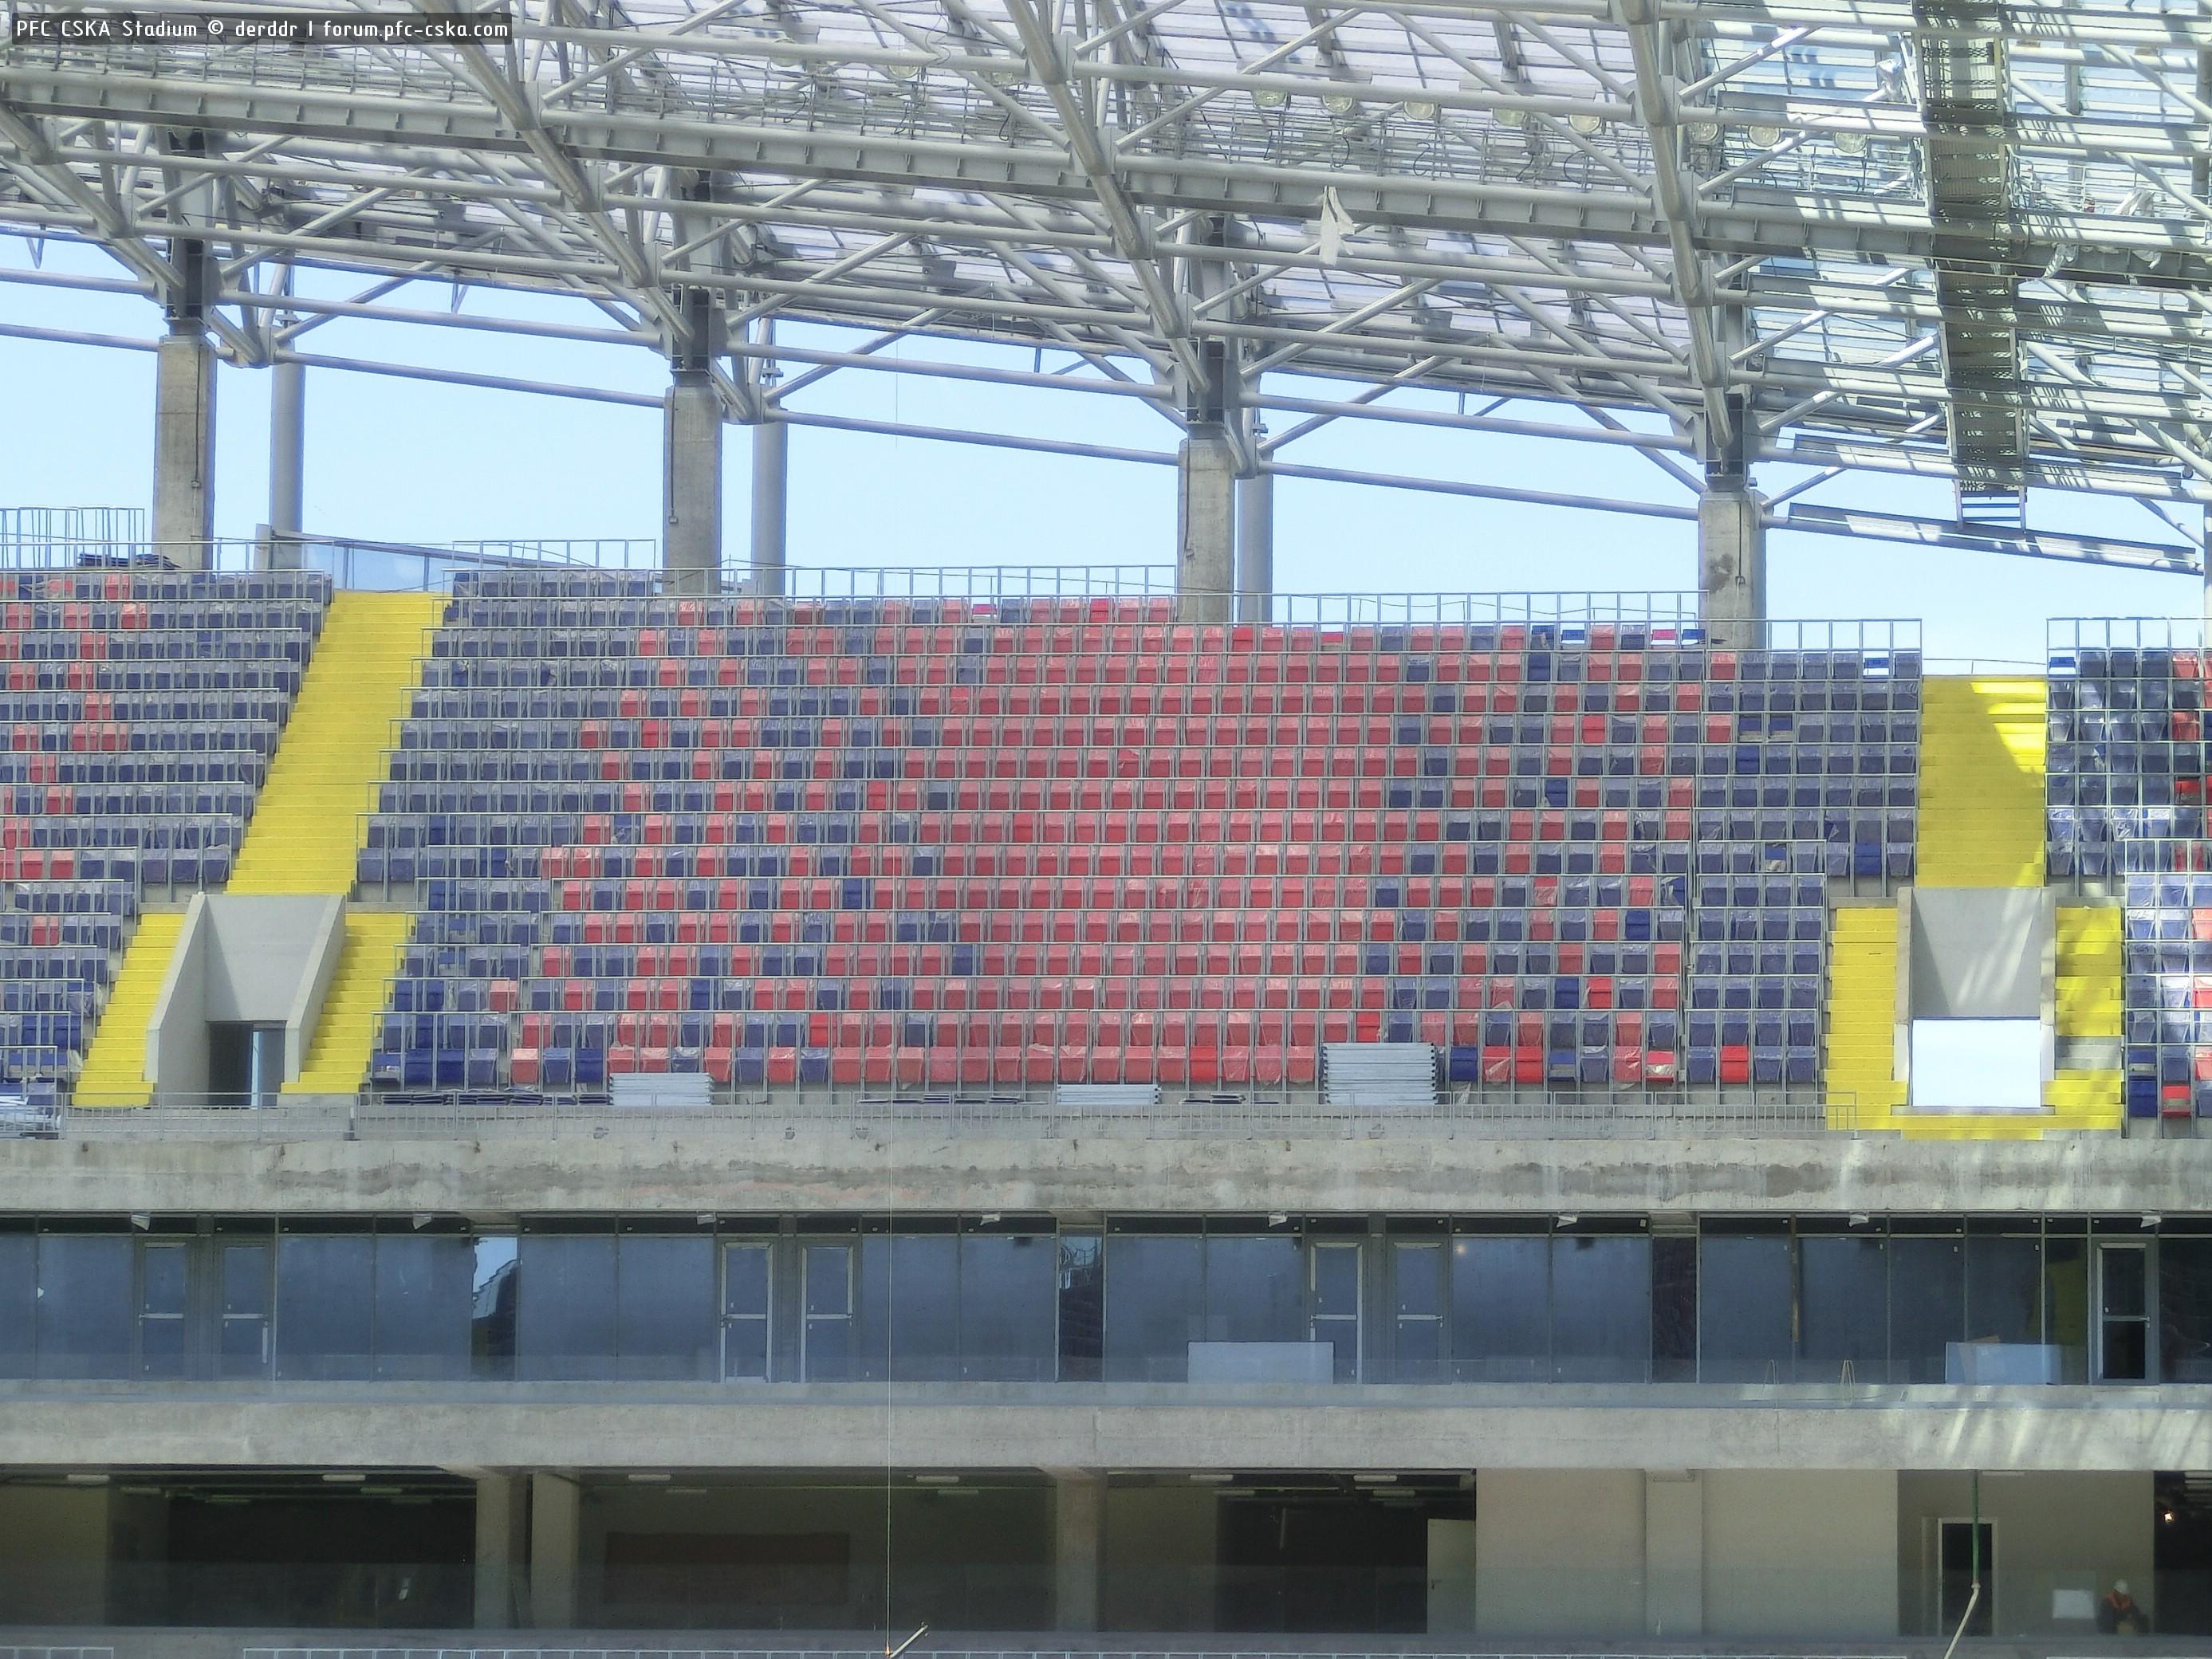 линзовидные скайбокс на стадионе цска фото снимок